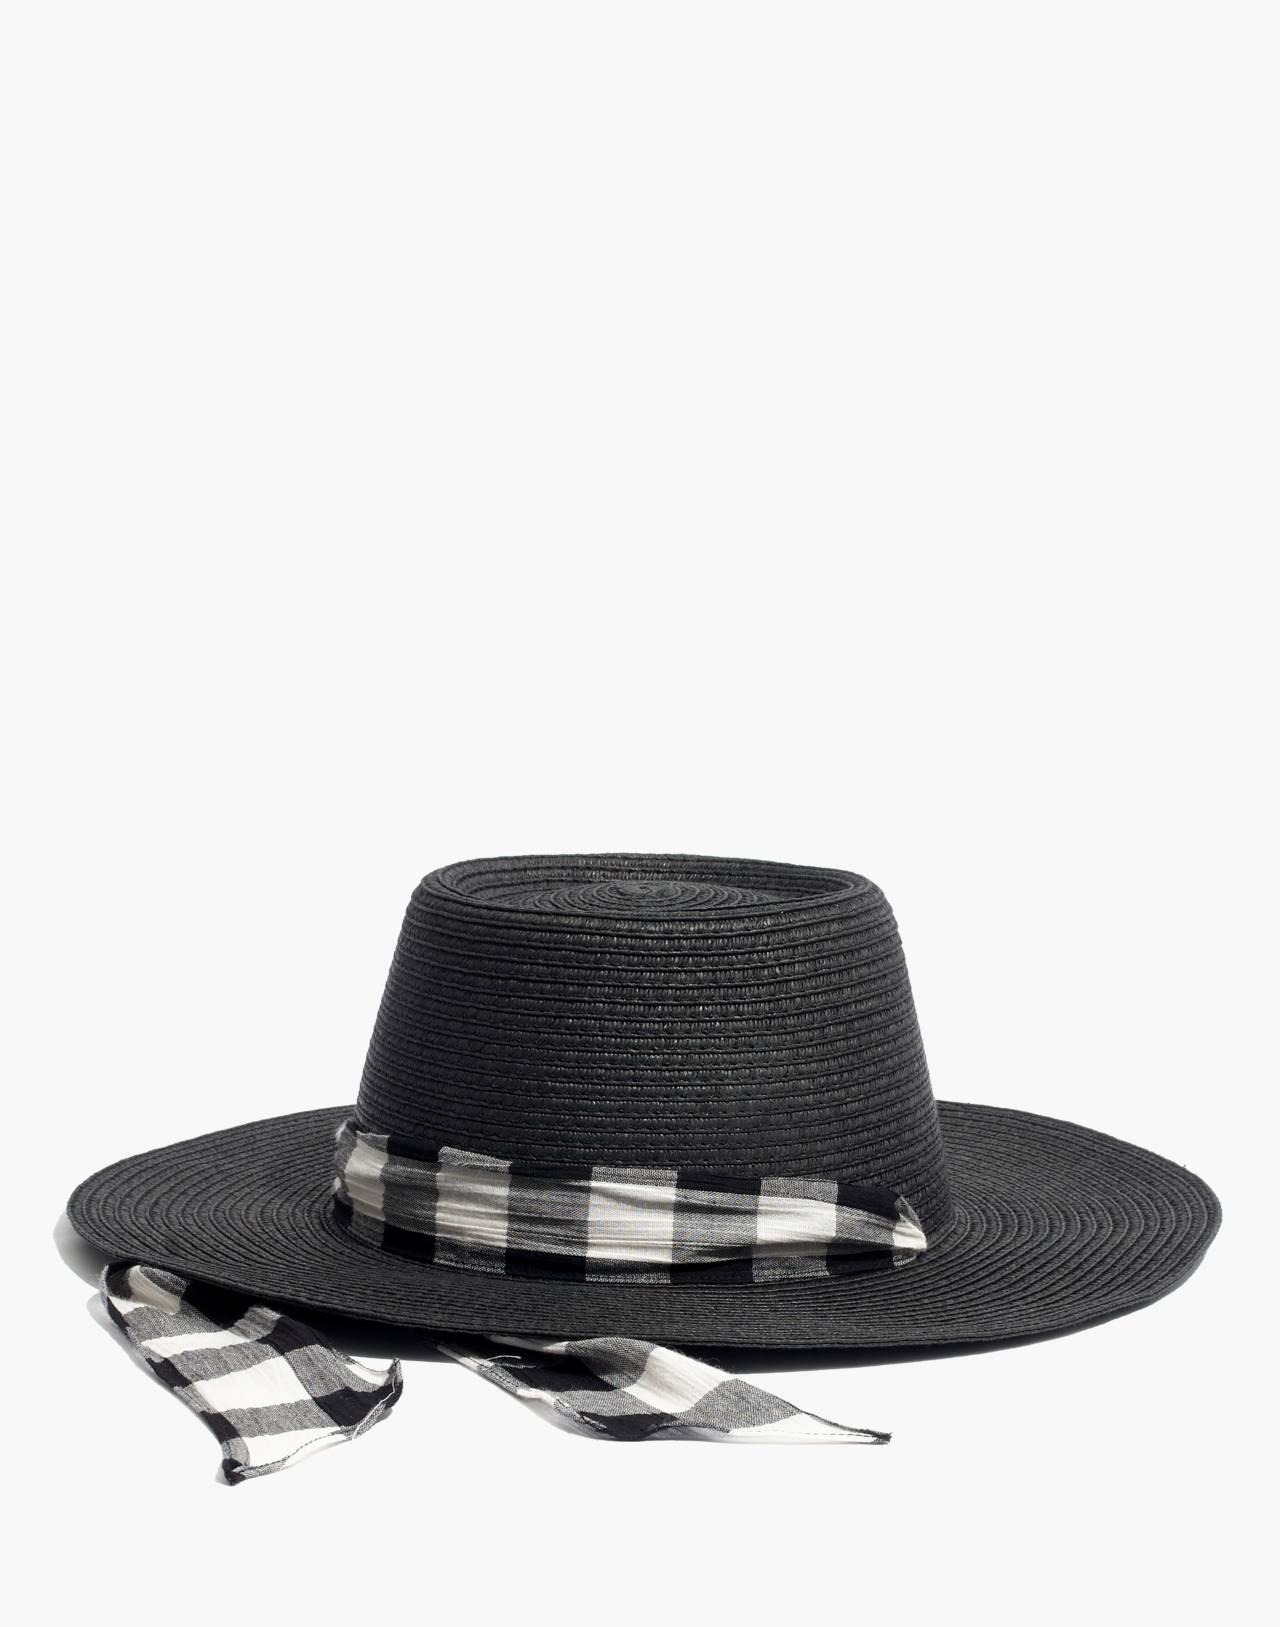 Stampede-Strap Straw Boater Hat in true black straw image 1